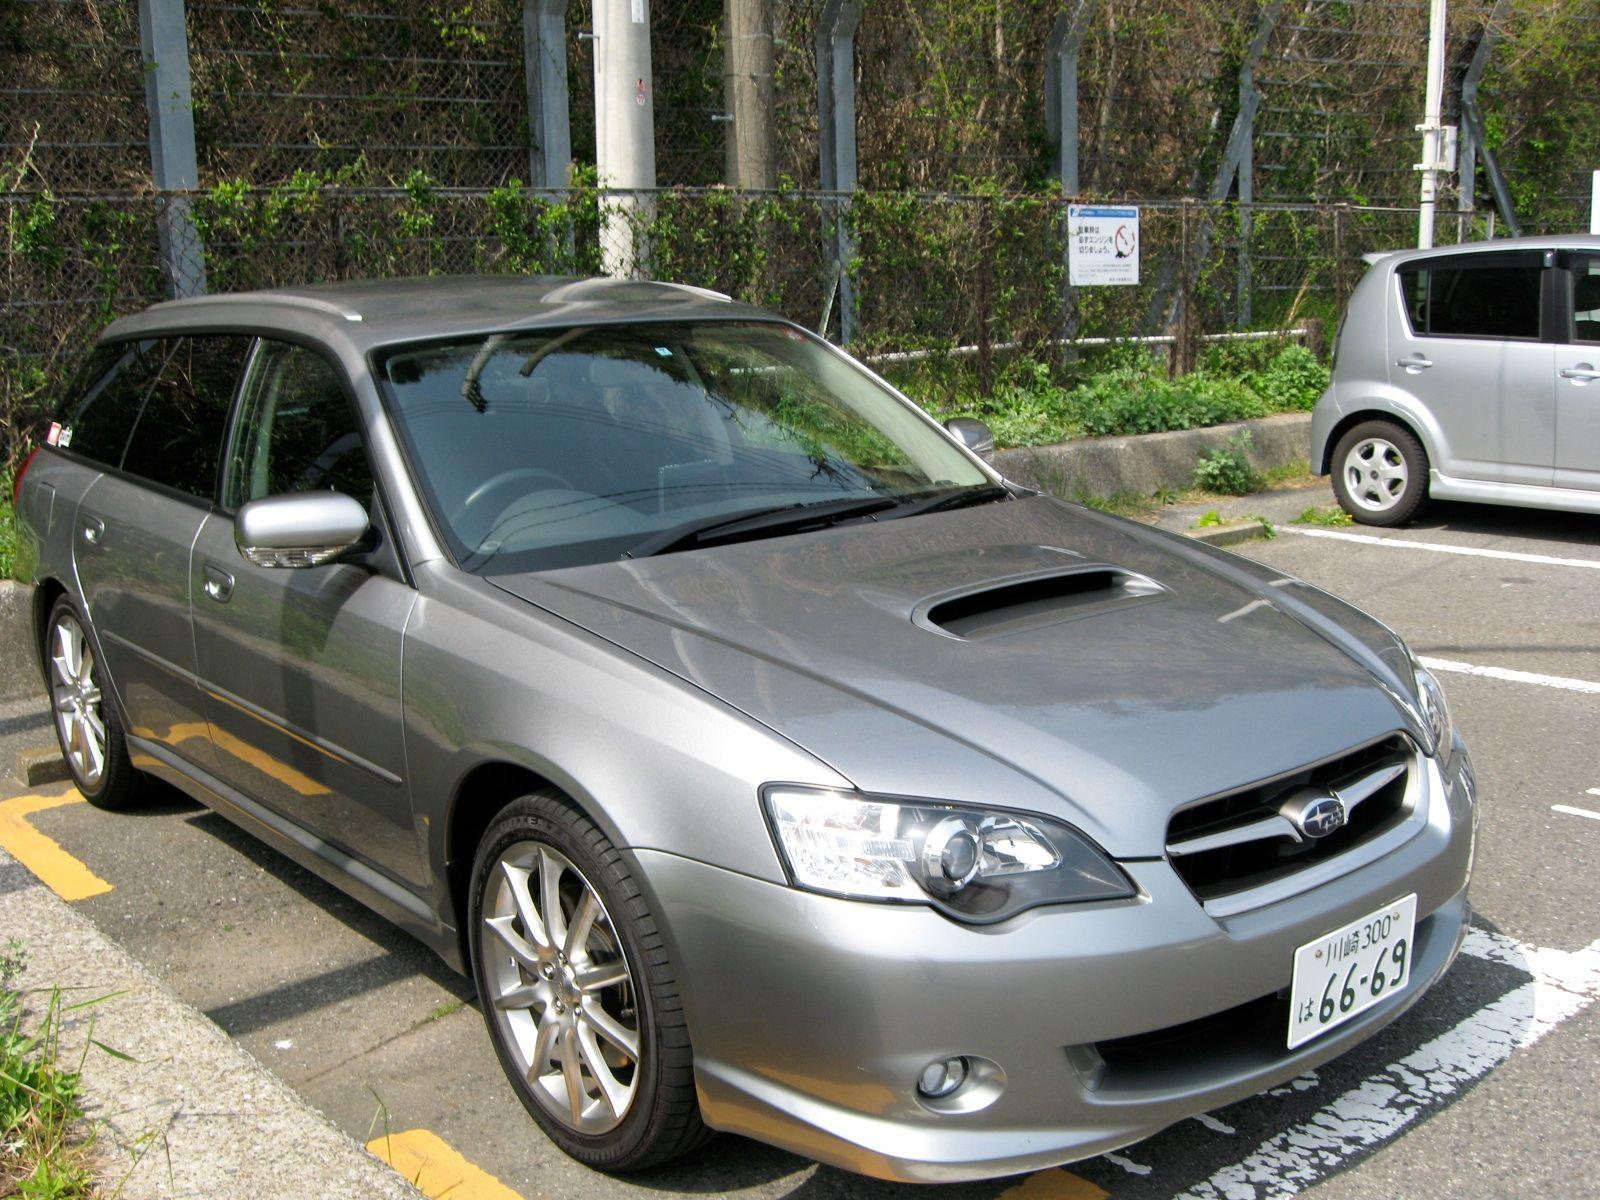 Subaru XV Crosstrek A new pact wagon like crossover SUV